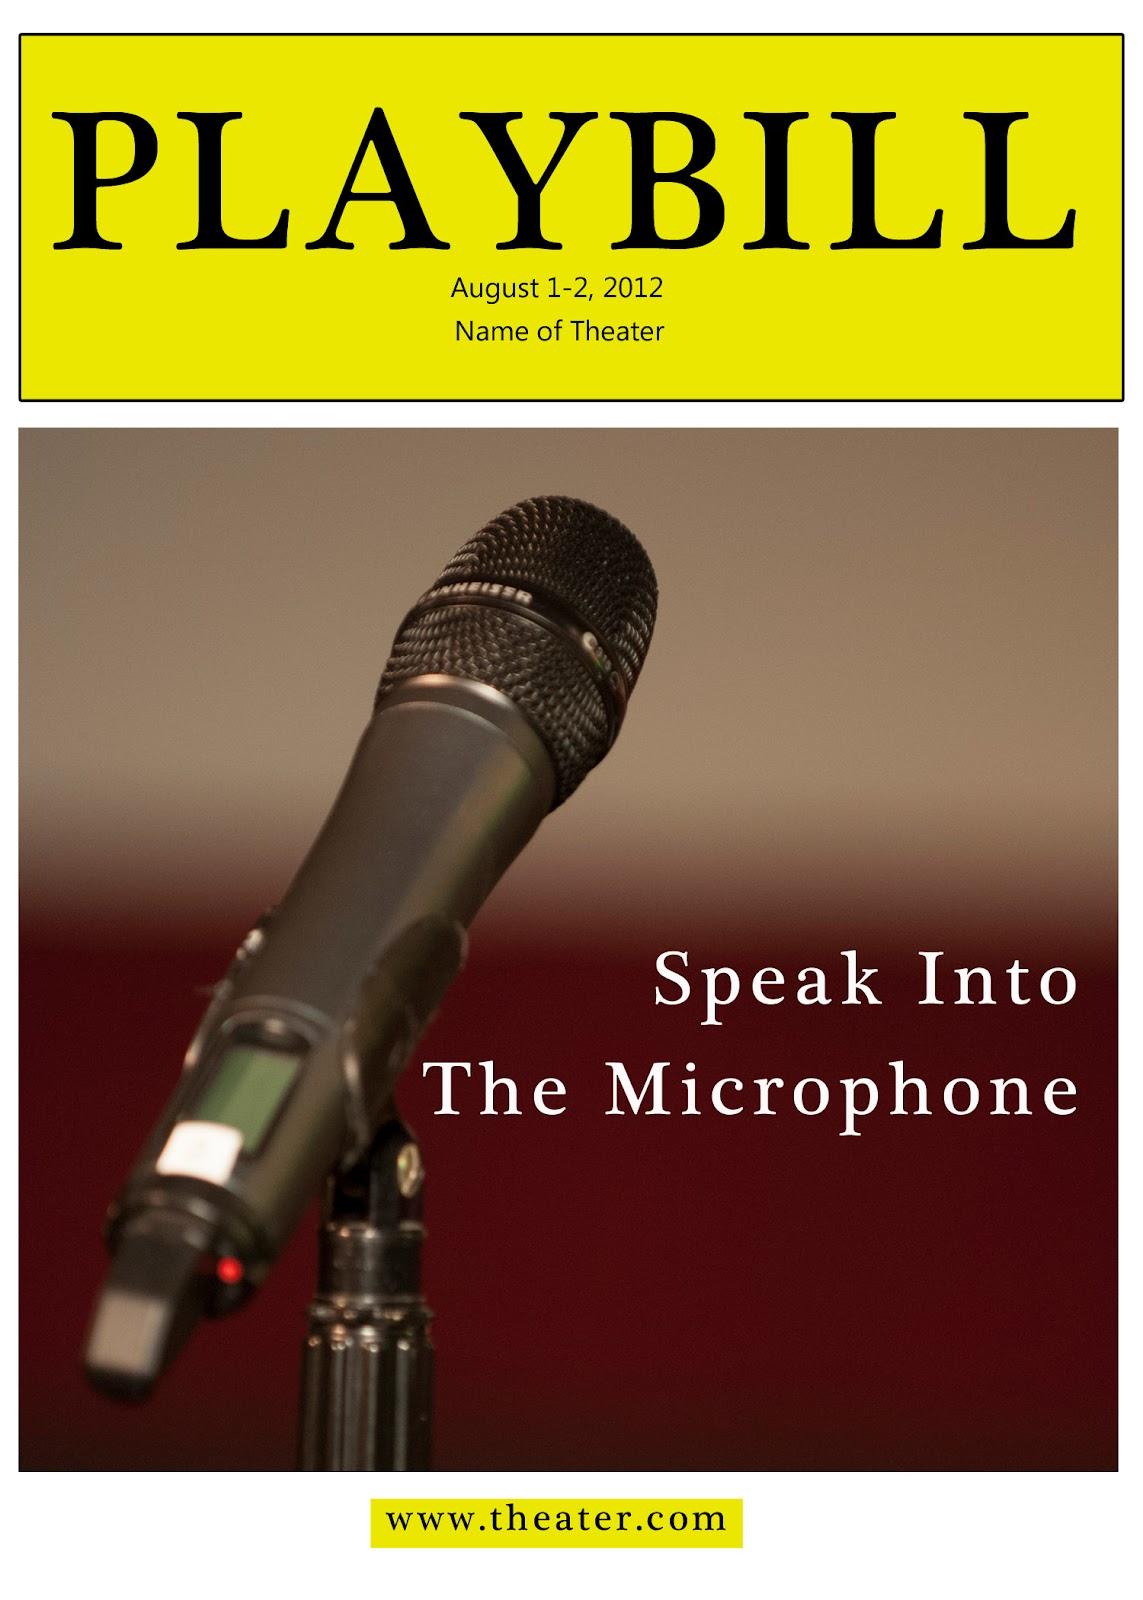 playbill template microsoft word